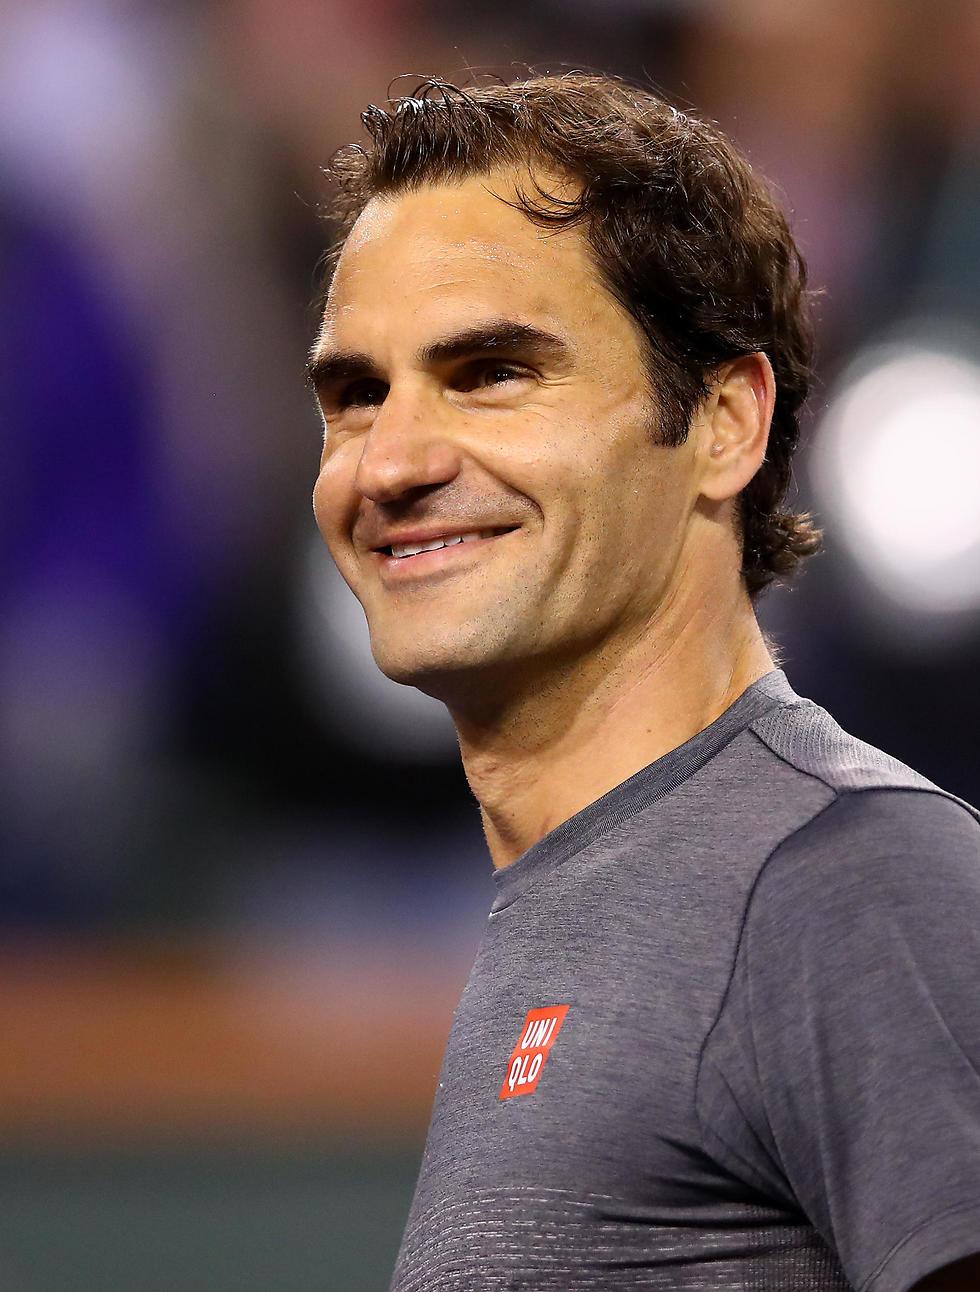 רוג'ר פדרר חוגג (צילום: Getty Images)